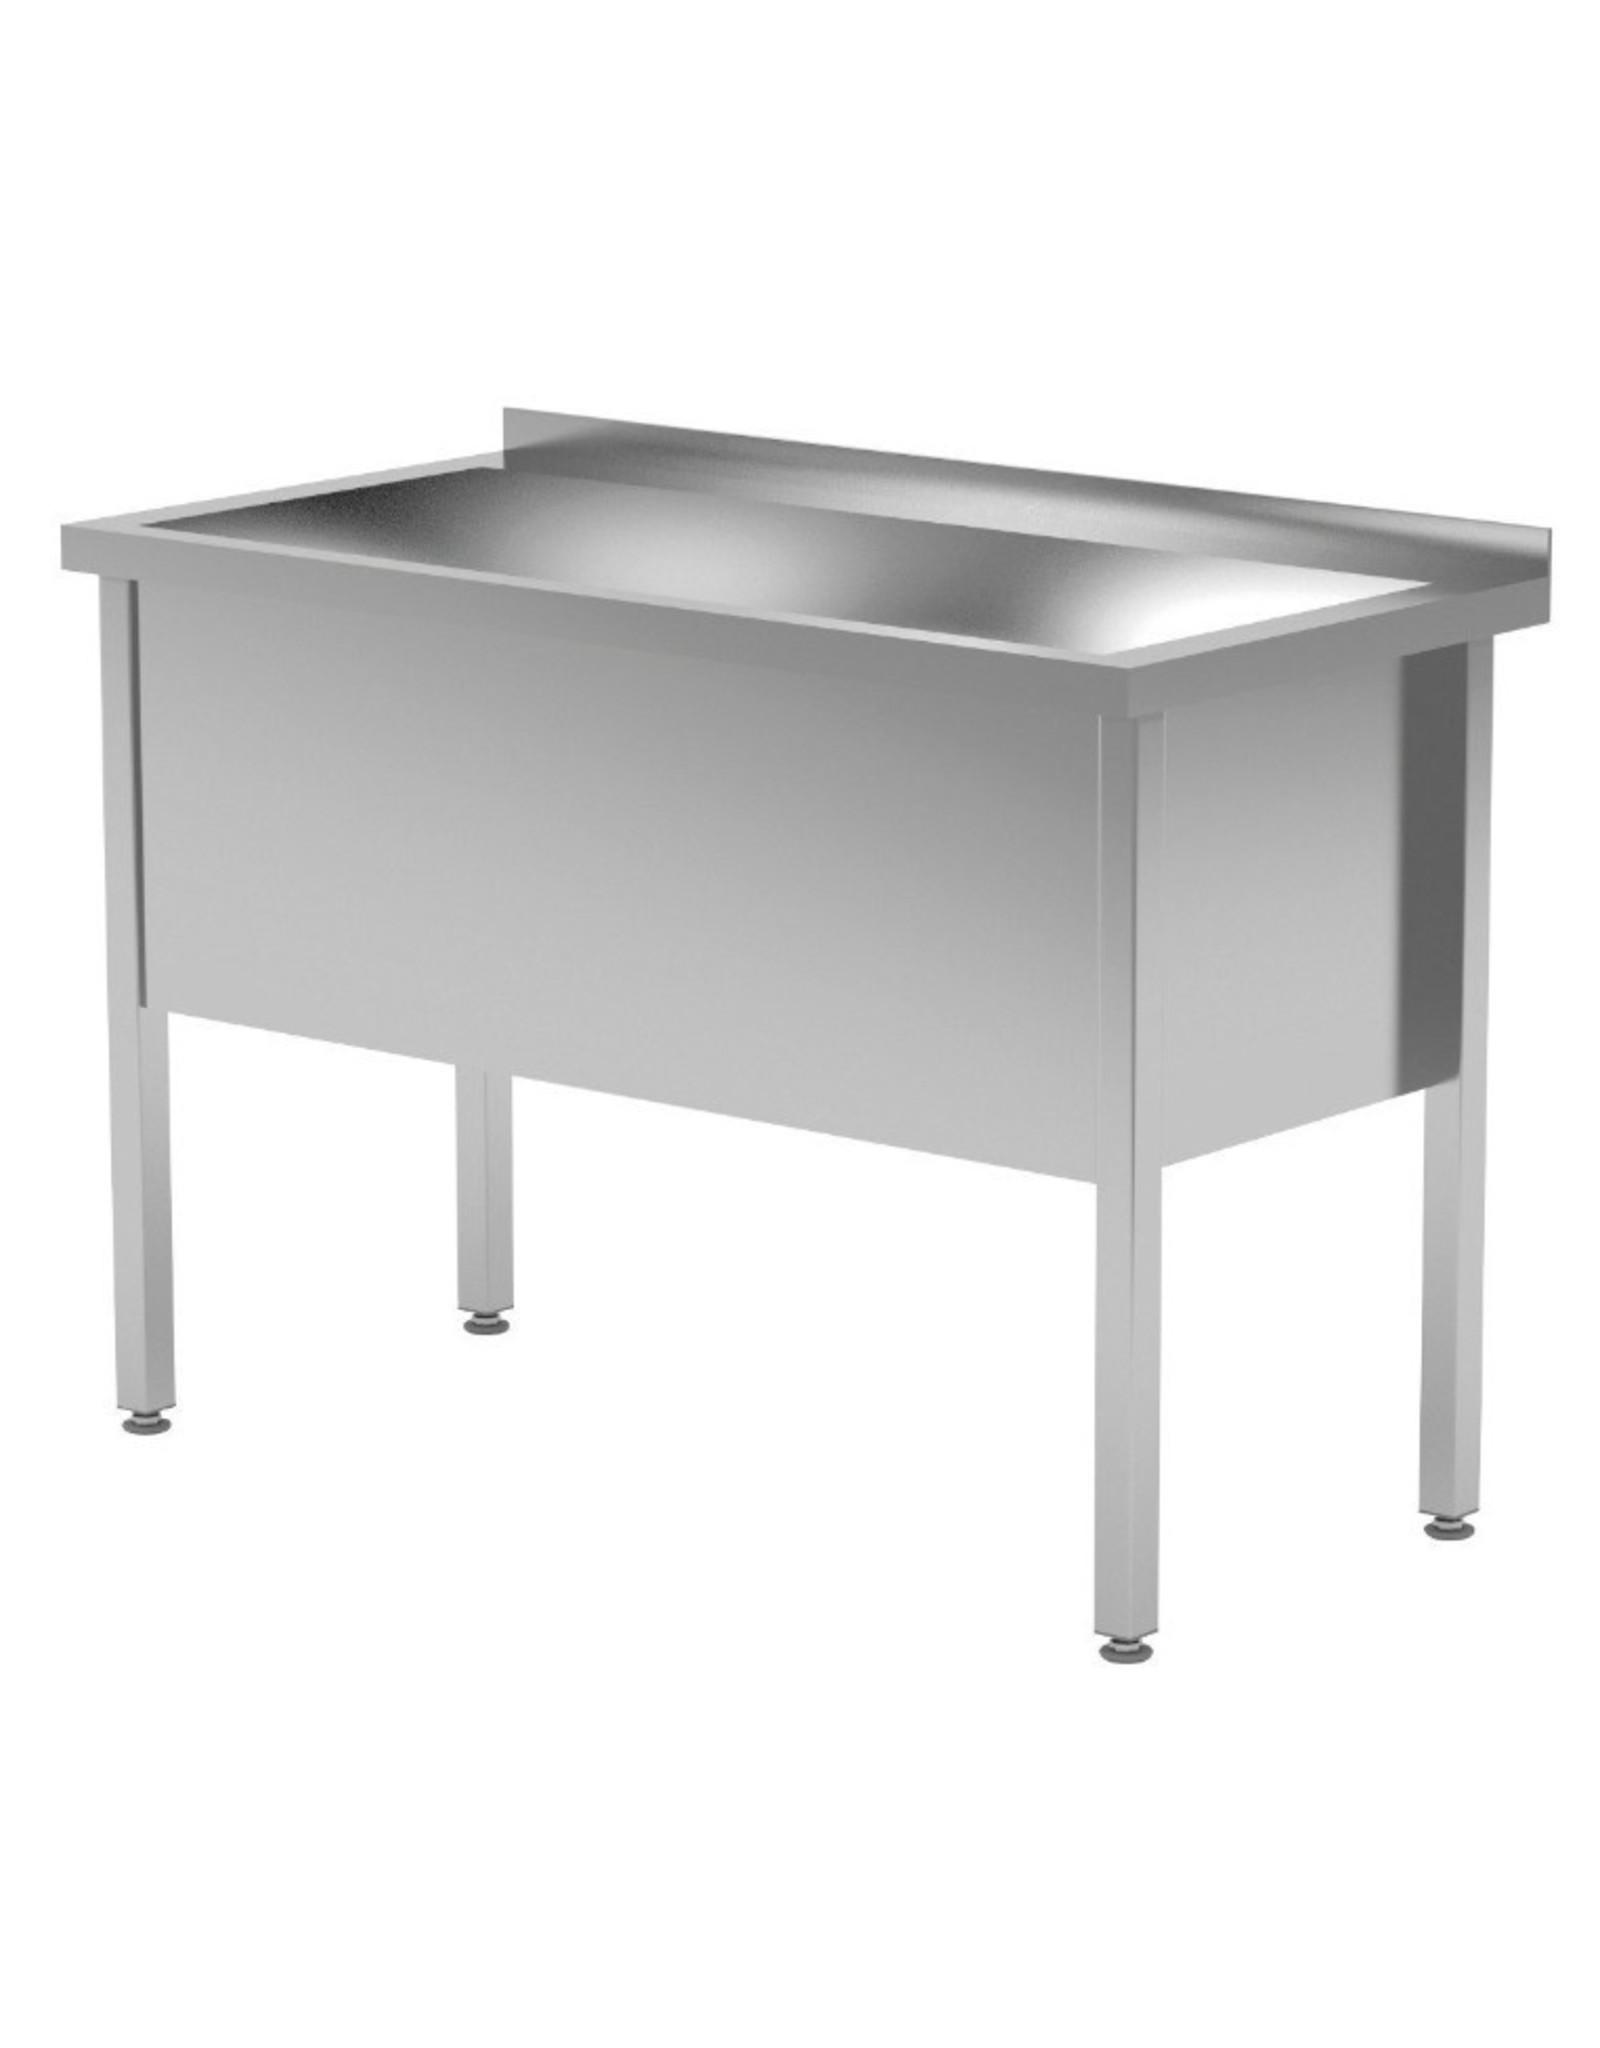 Grote wasbak tafel | 400mm diepte wasbak | 600-1200mm breed | 600 of 700mm diep